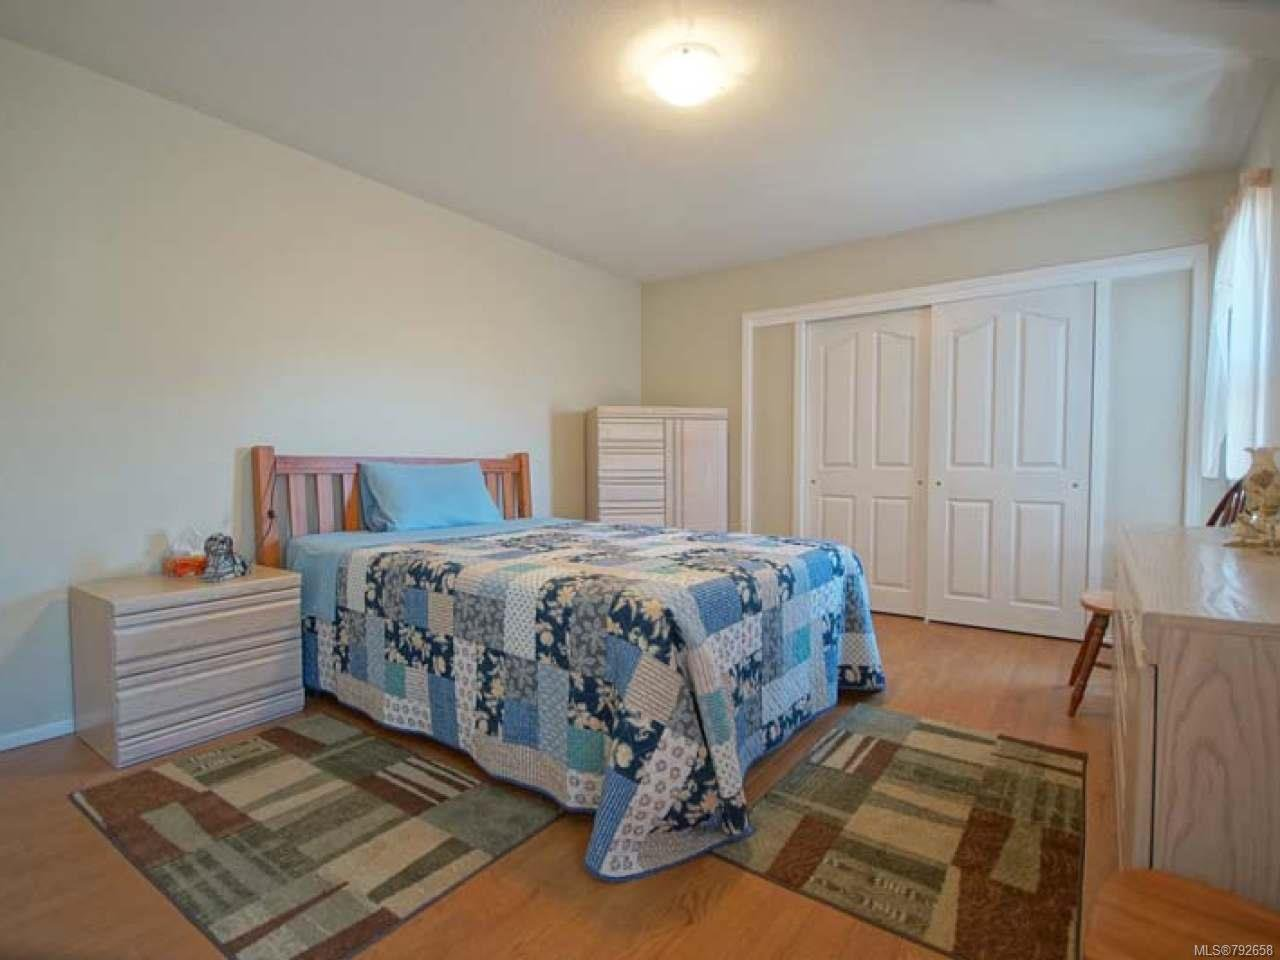 Photo 6: Photos: 893 EDGEWARE Avenue in PARKSVILLE: PQ Parksville House for sale (Parksville/Qualicum)  : MLS®# 792658